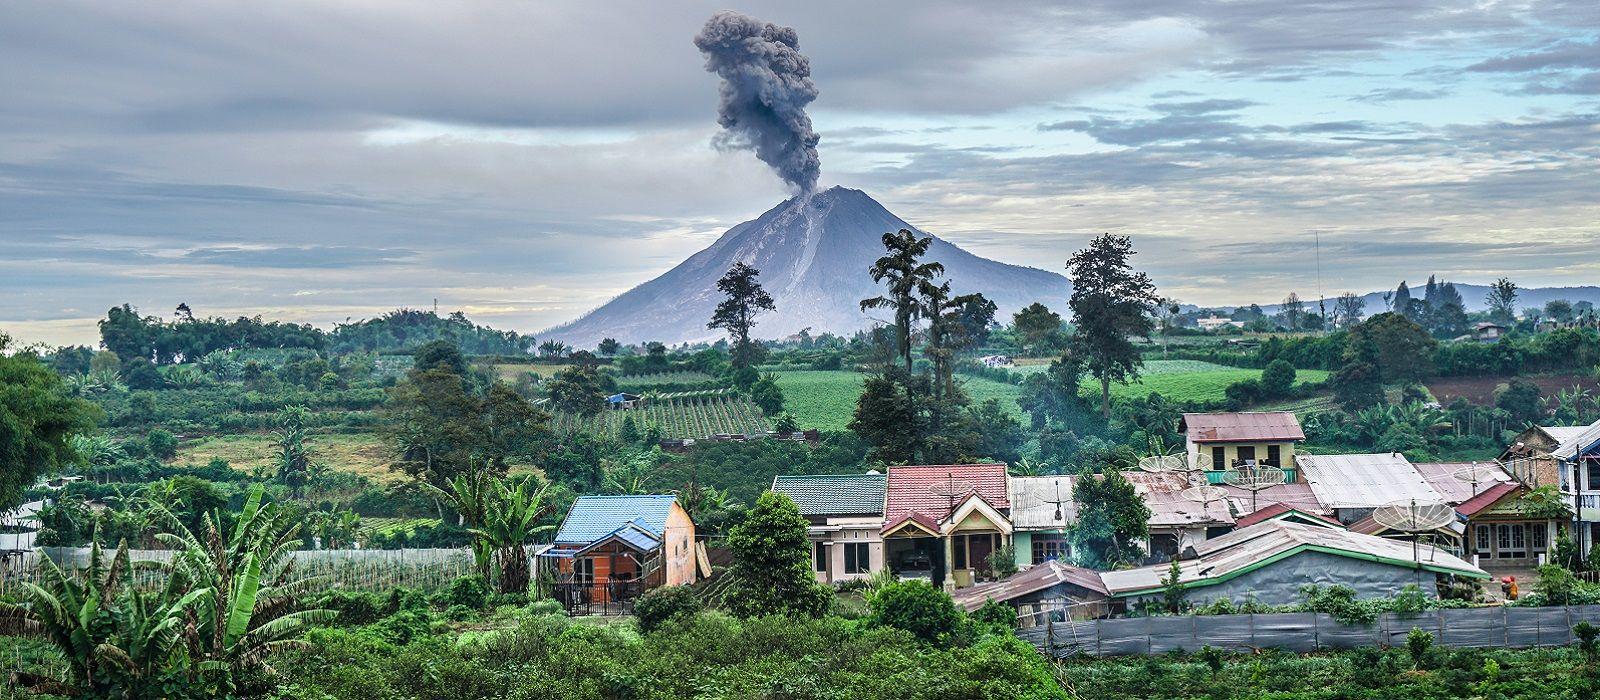 Die Klassiker auf Sumatra und Java Urlaub 3